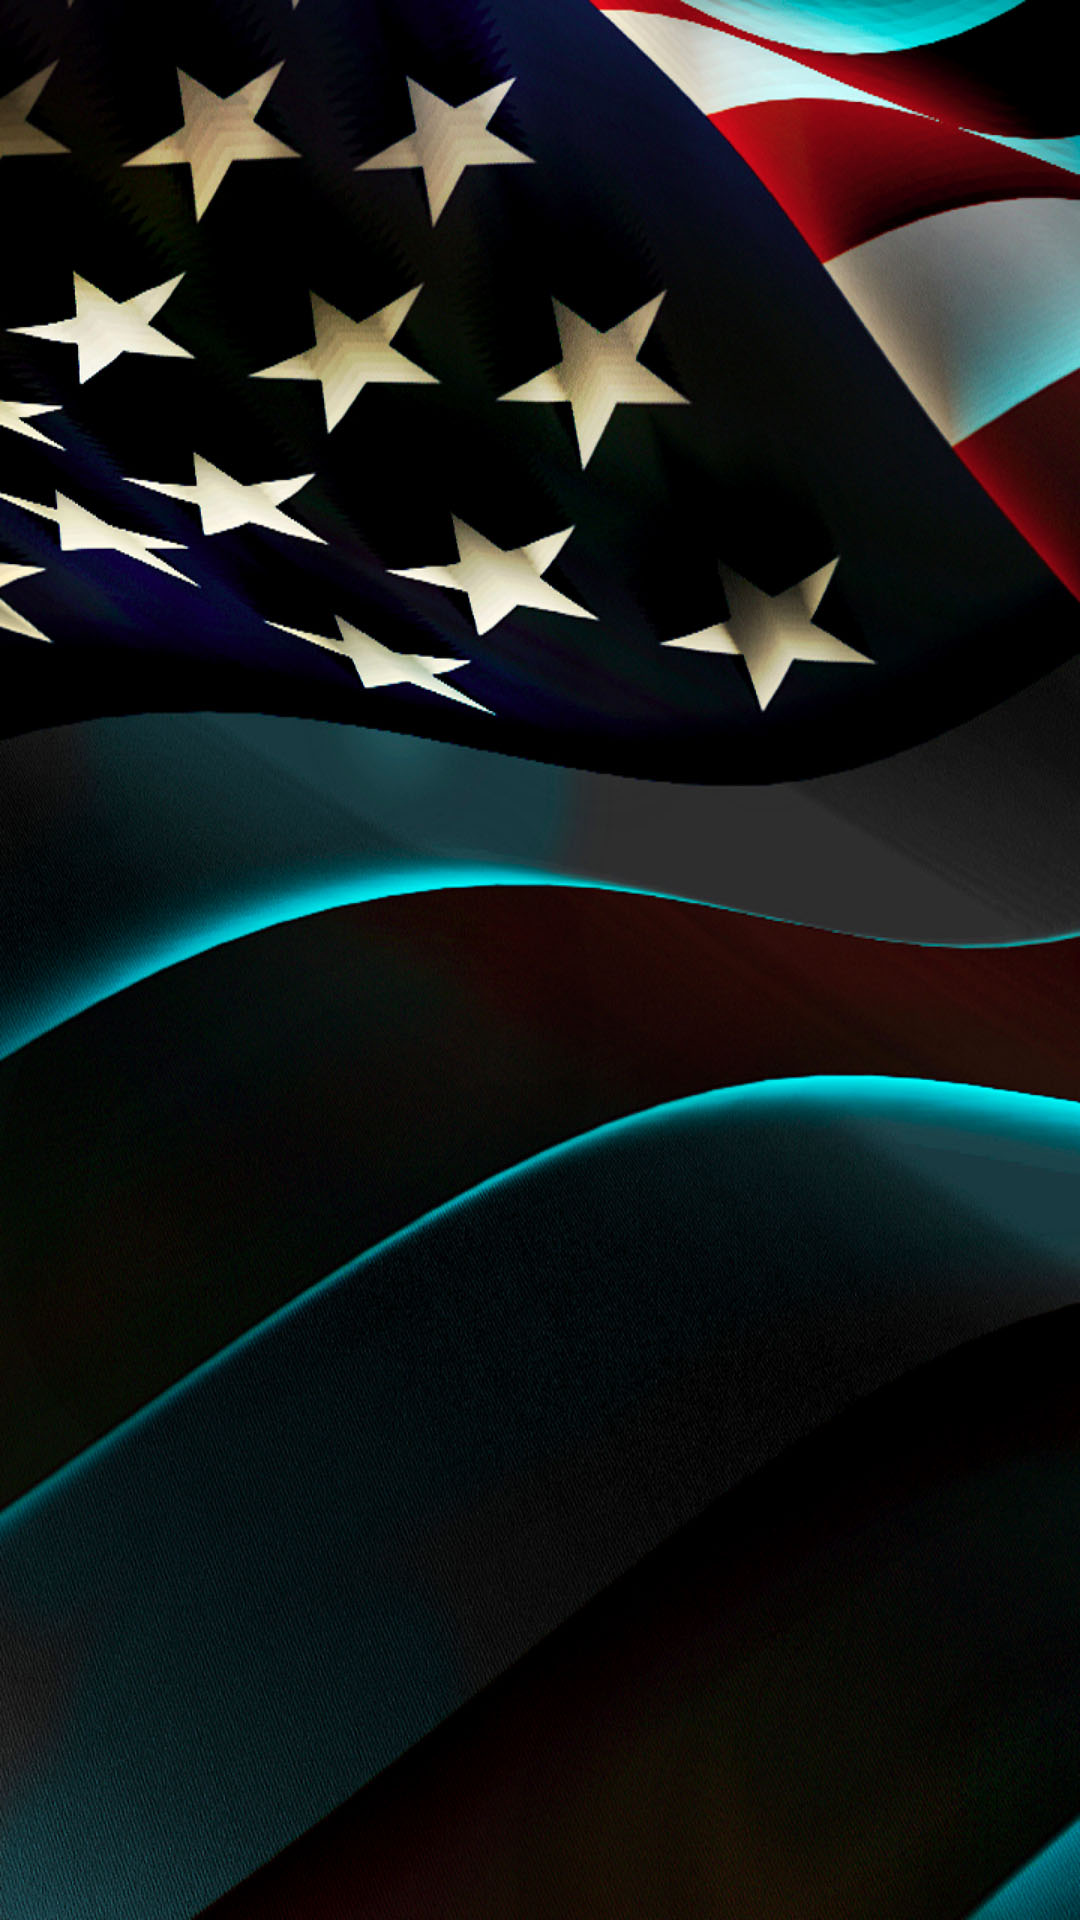 american flag hd iphone wallpapers pixelstalk net